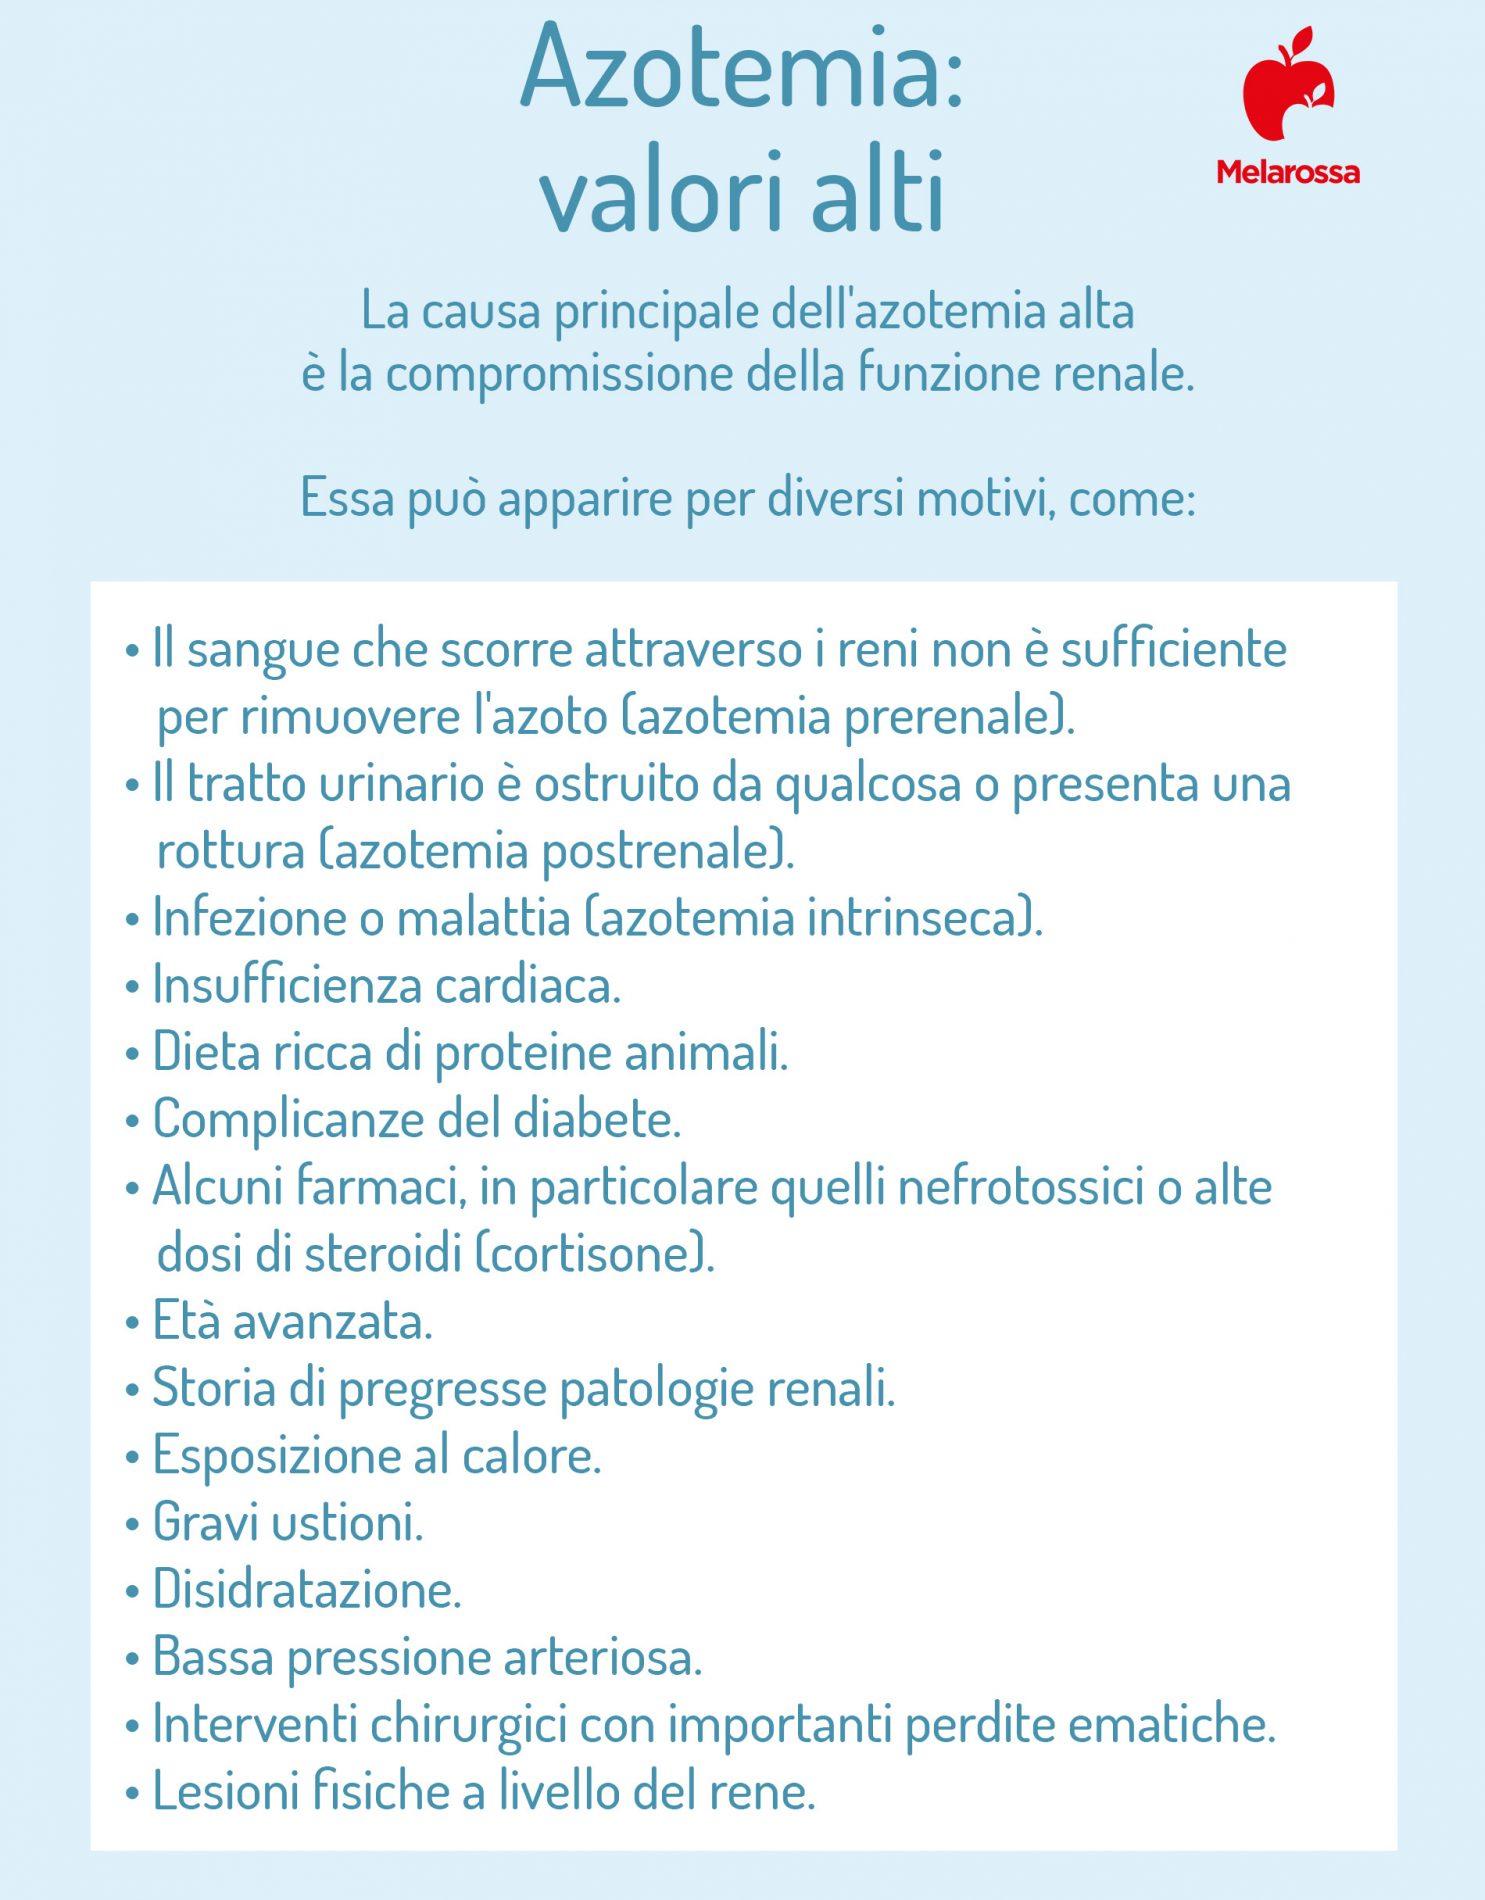 azotemia: valori alti